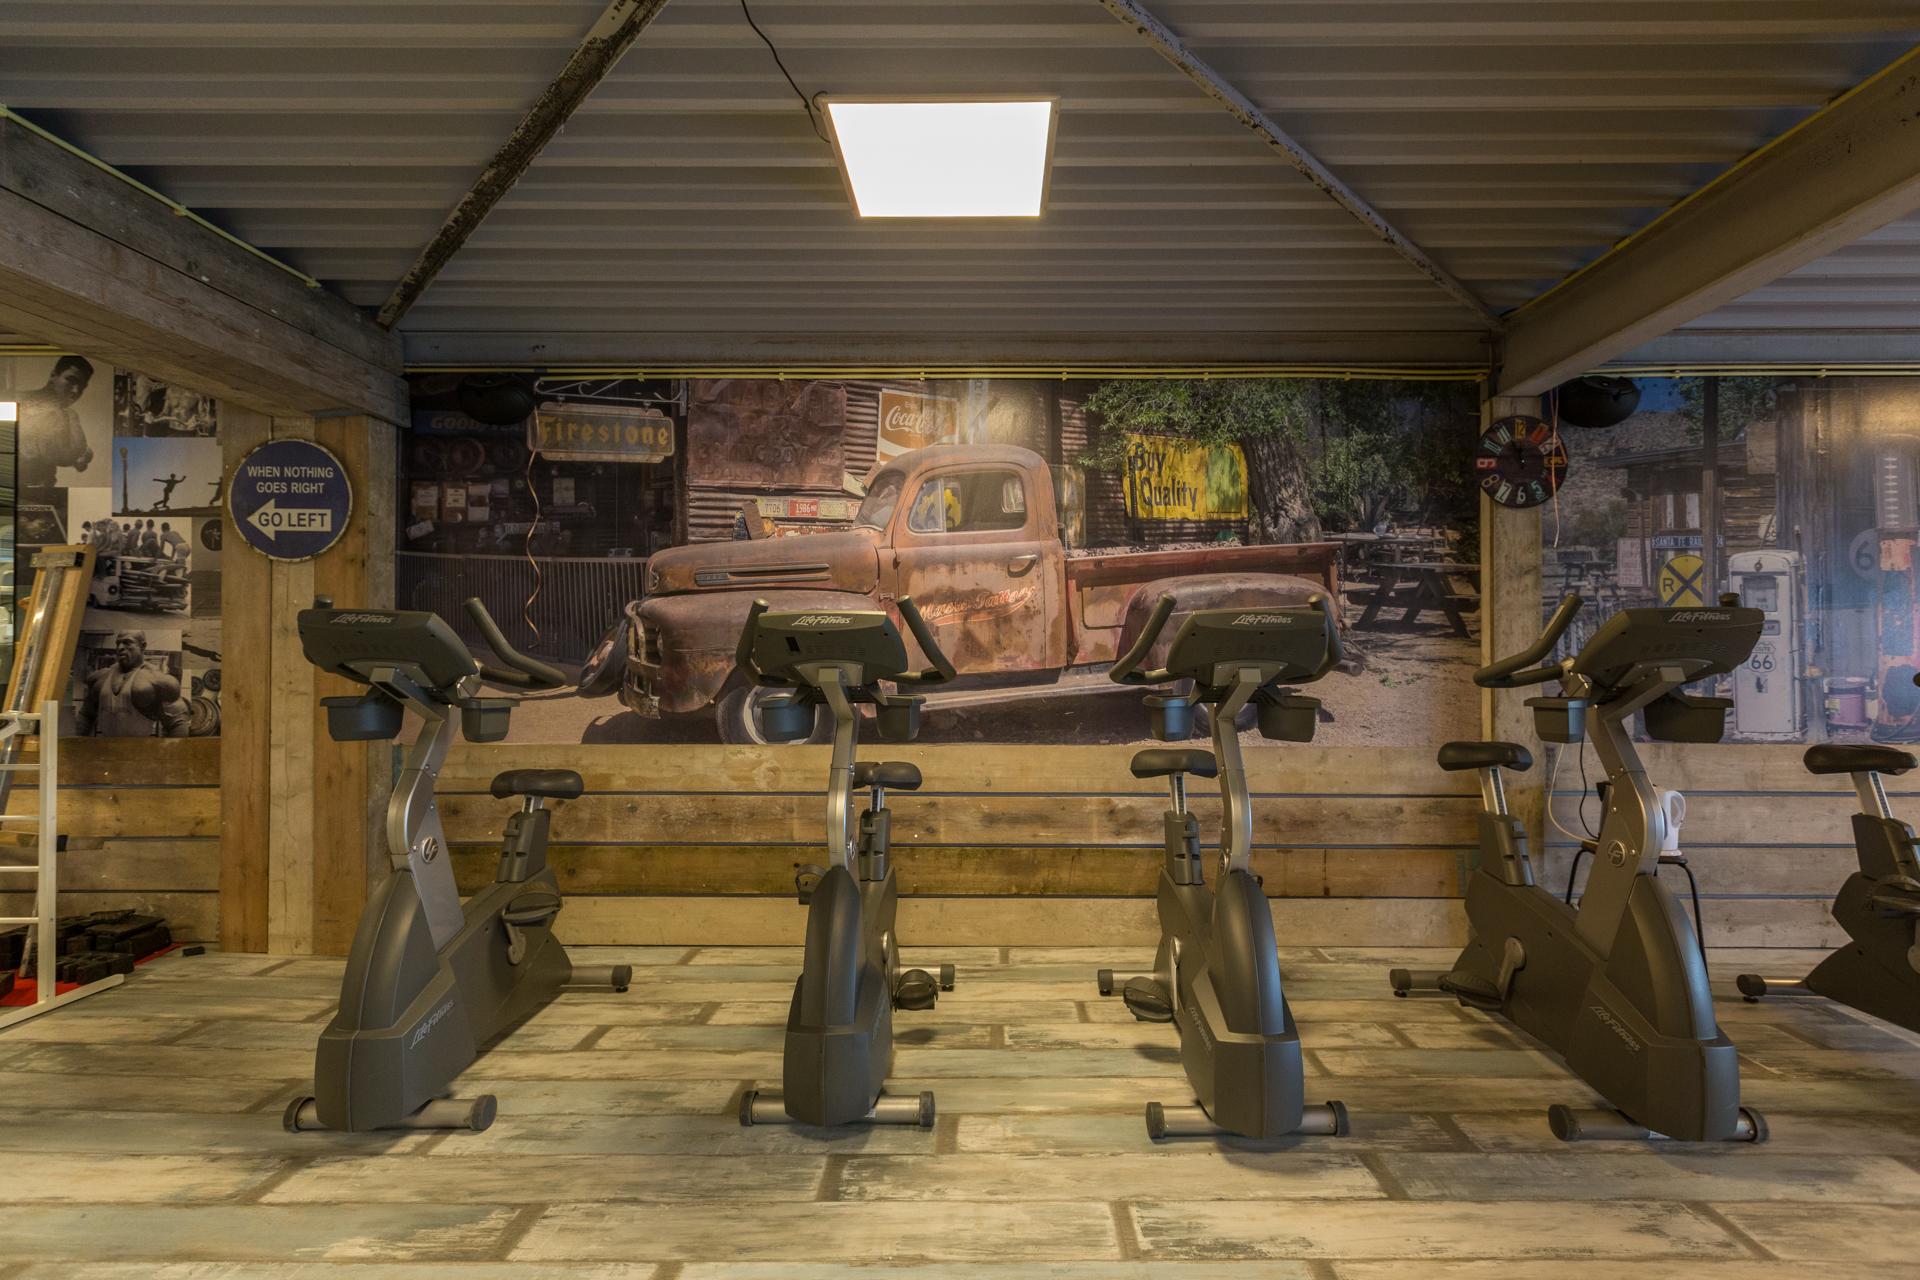 fitnesscentremetamorfose.nl - Bikes